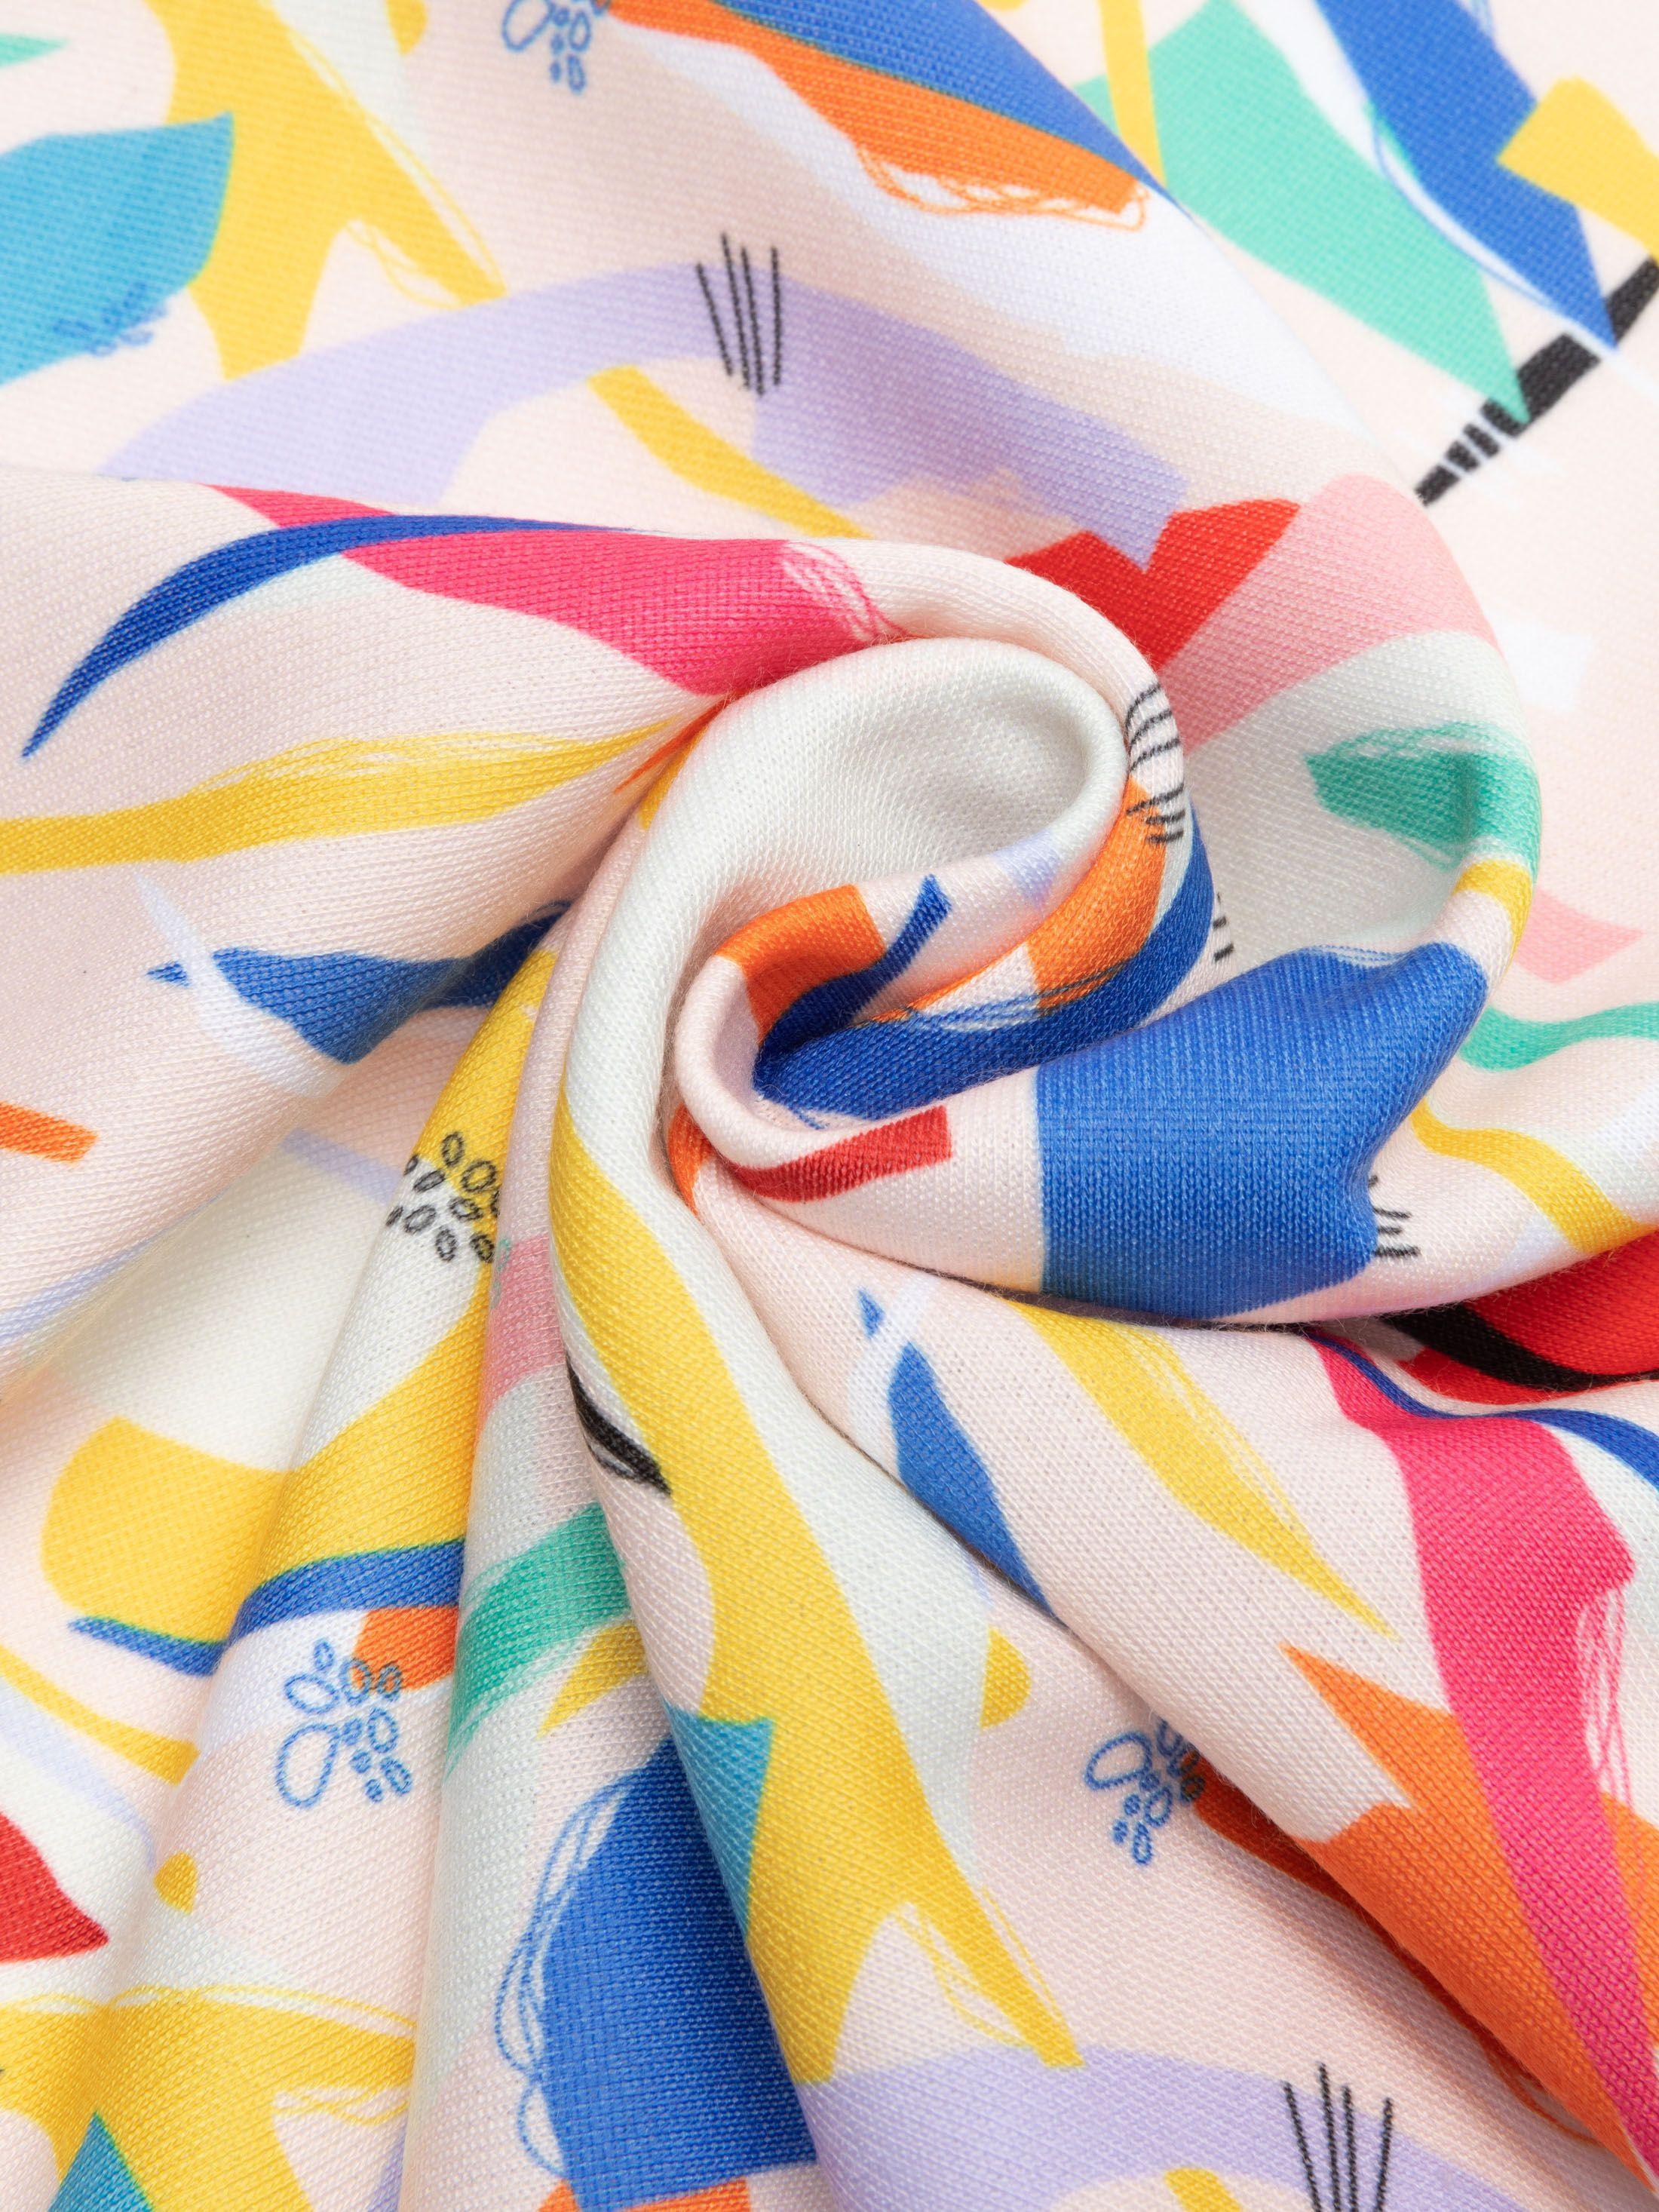 Loop Back Jersey Fabric Printing